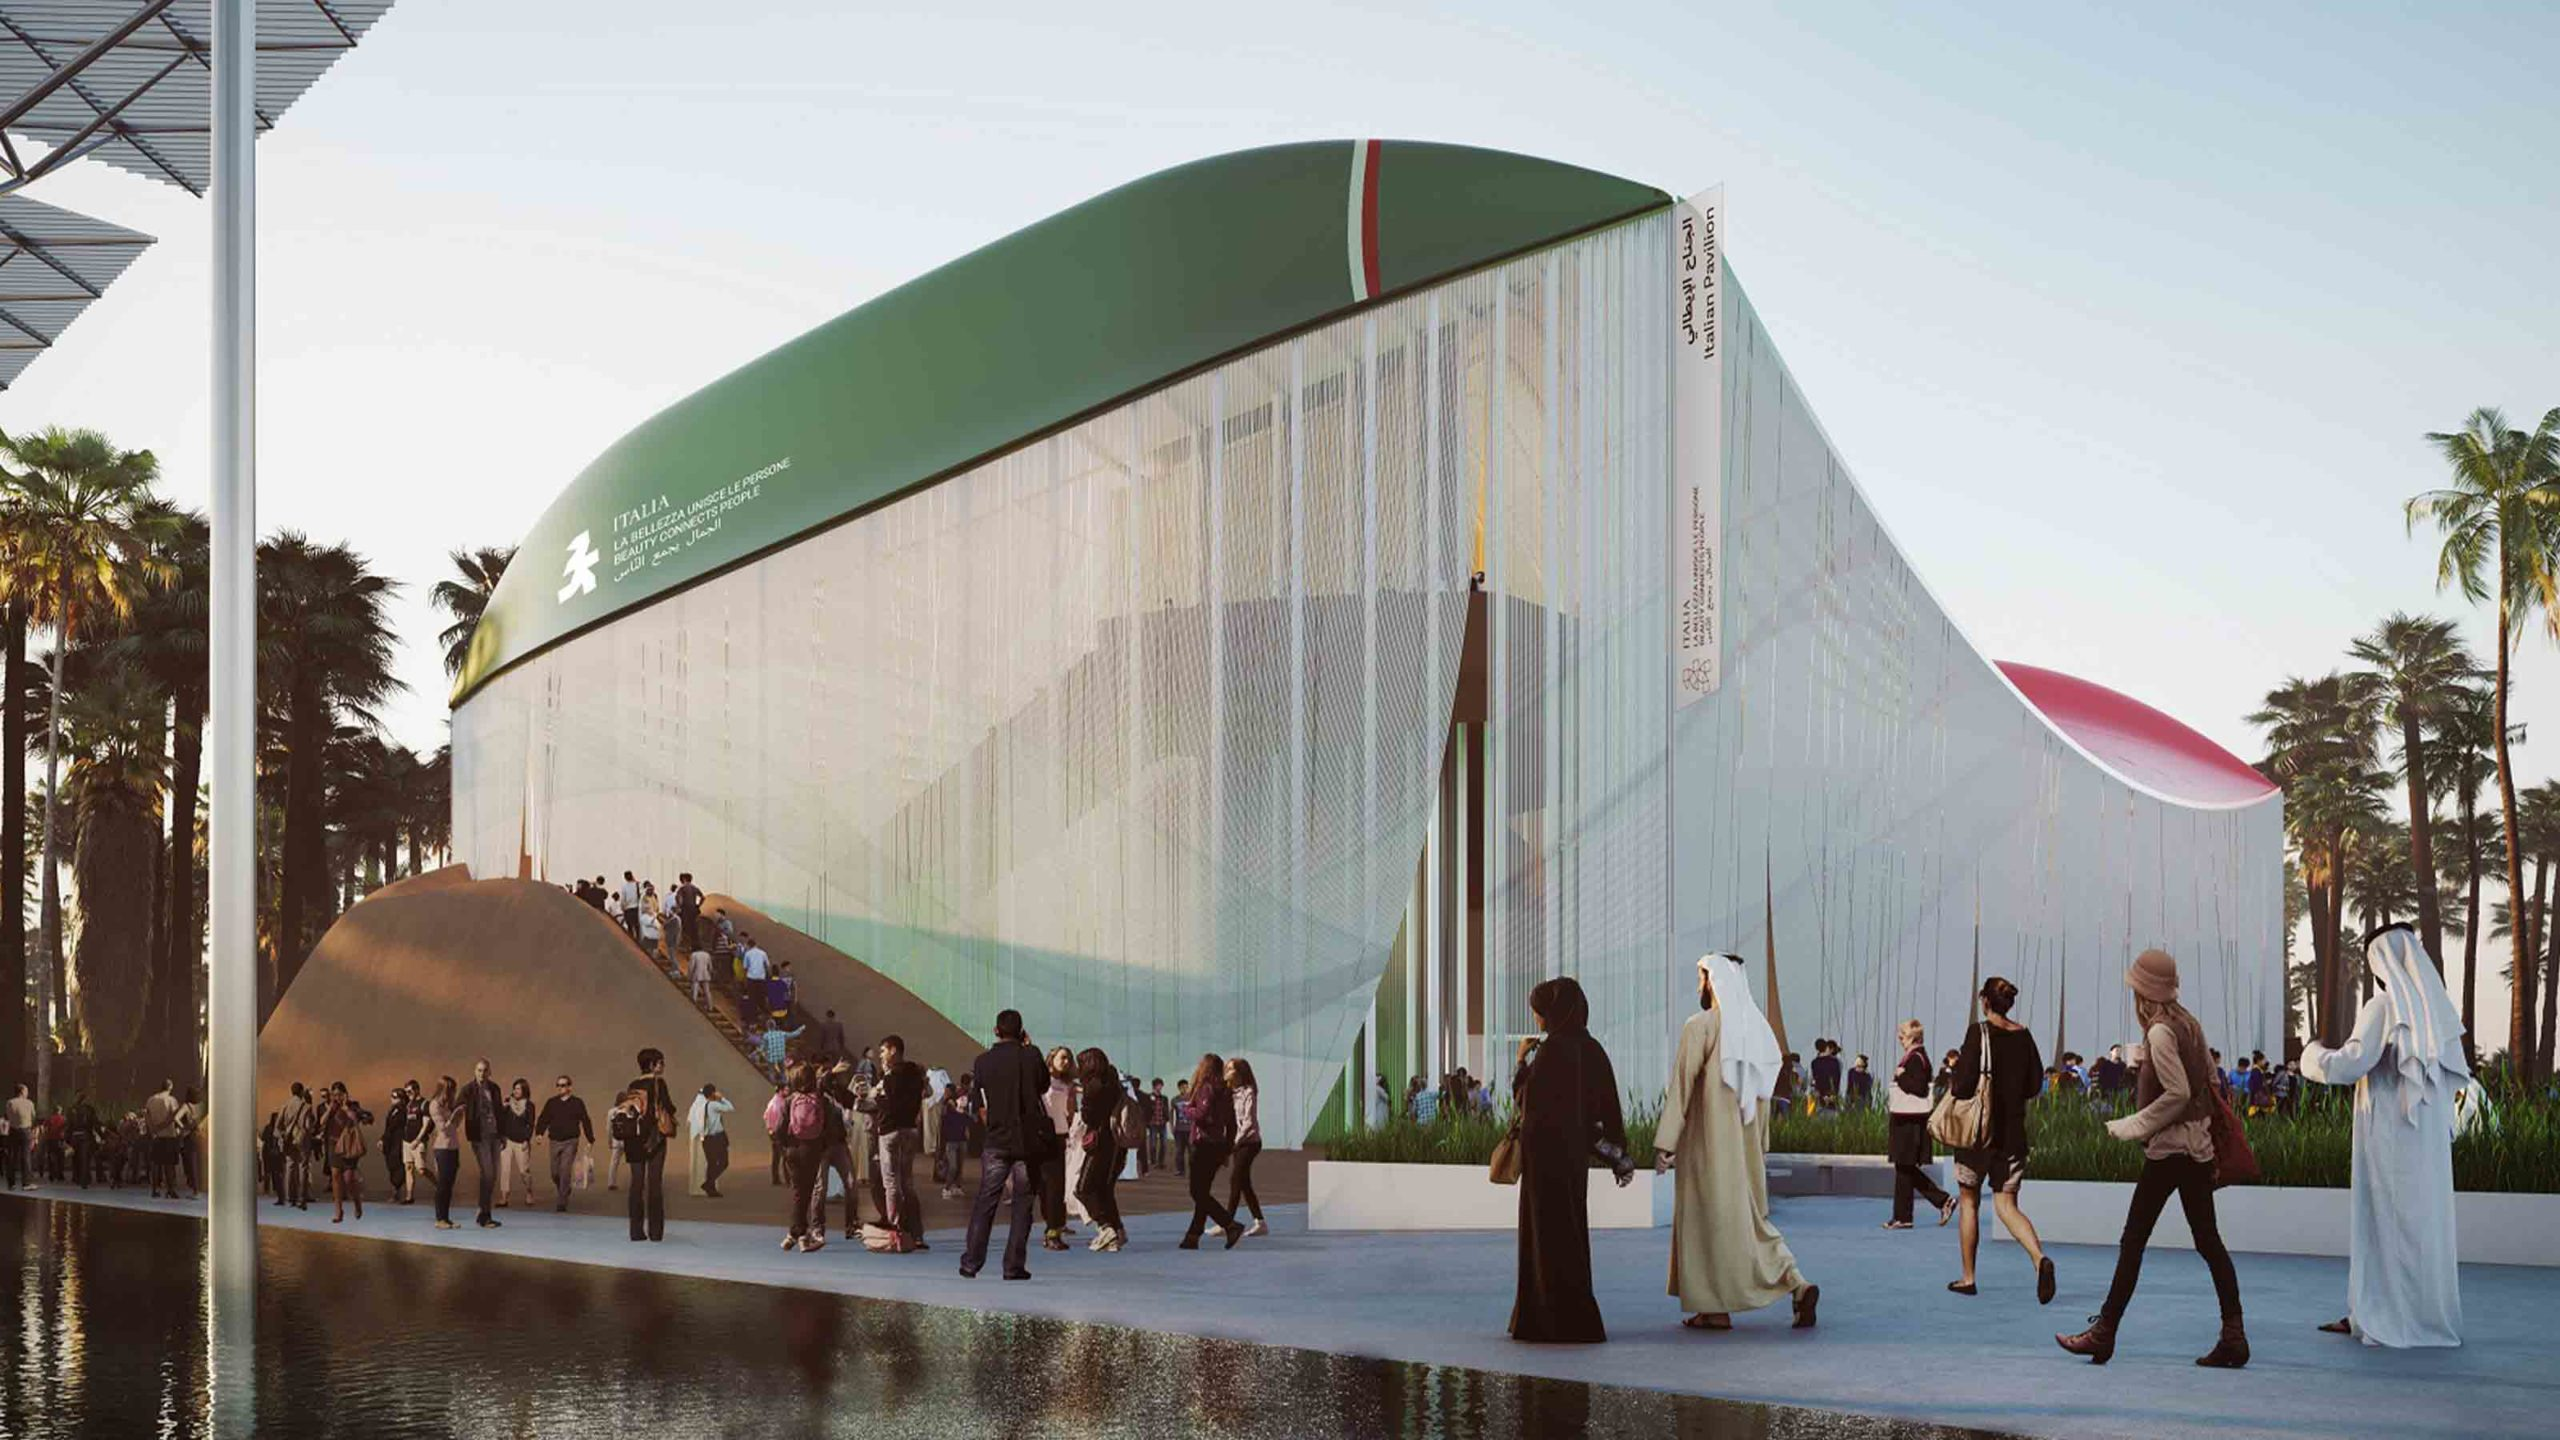 EXPO 2020 – Italy Pavilion